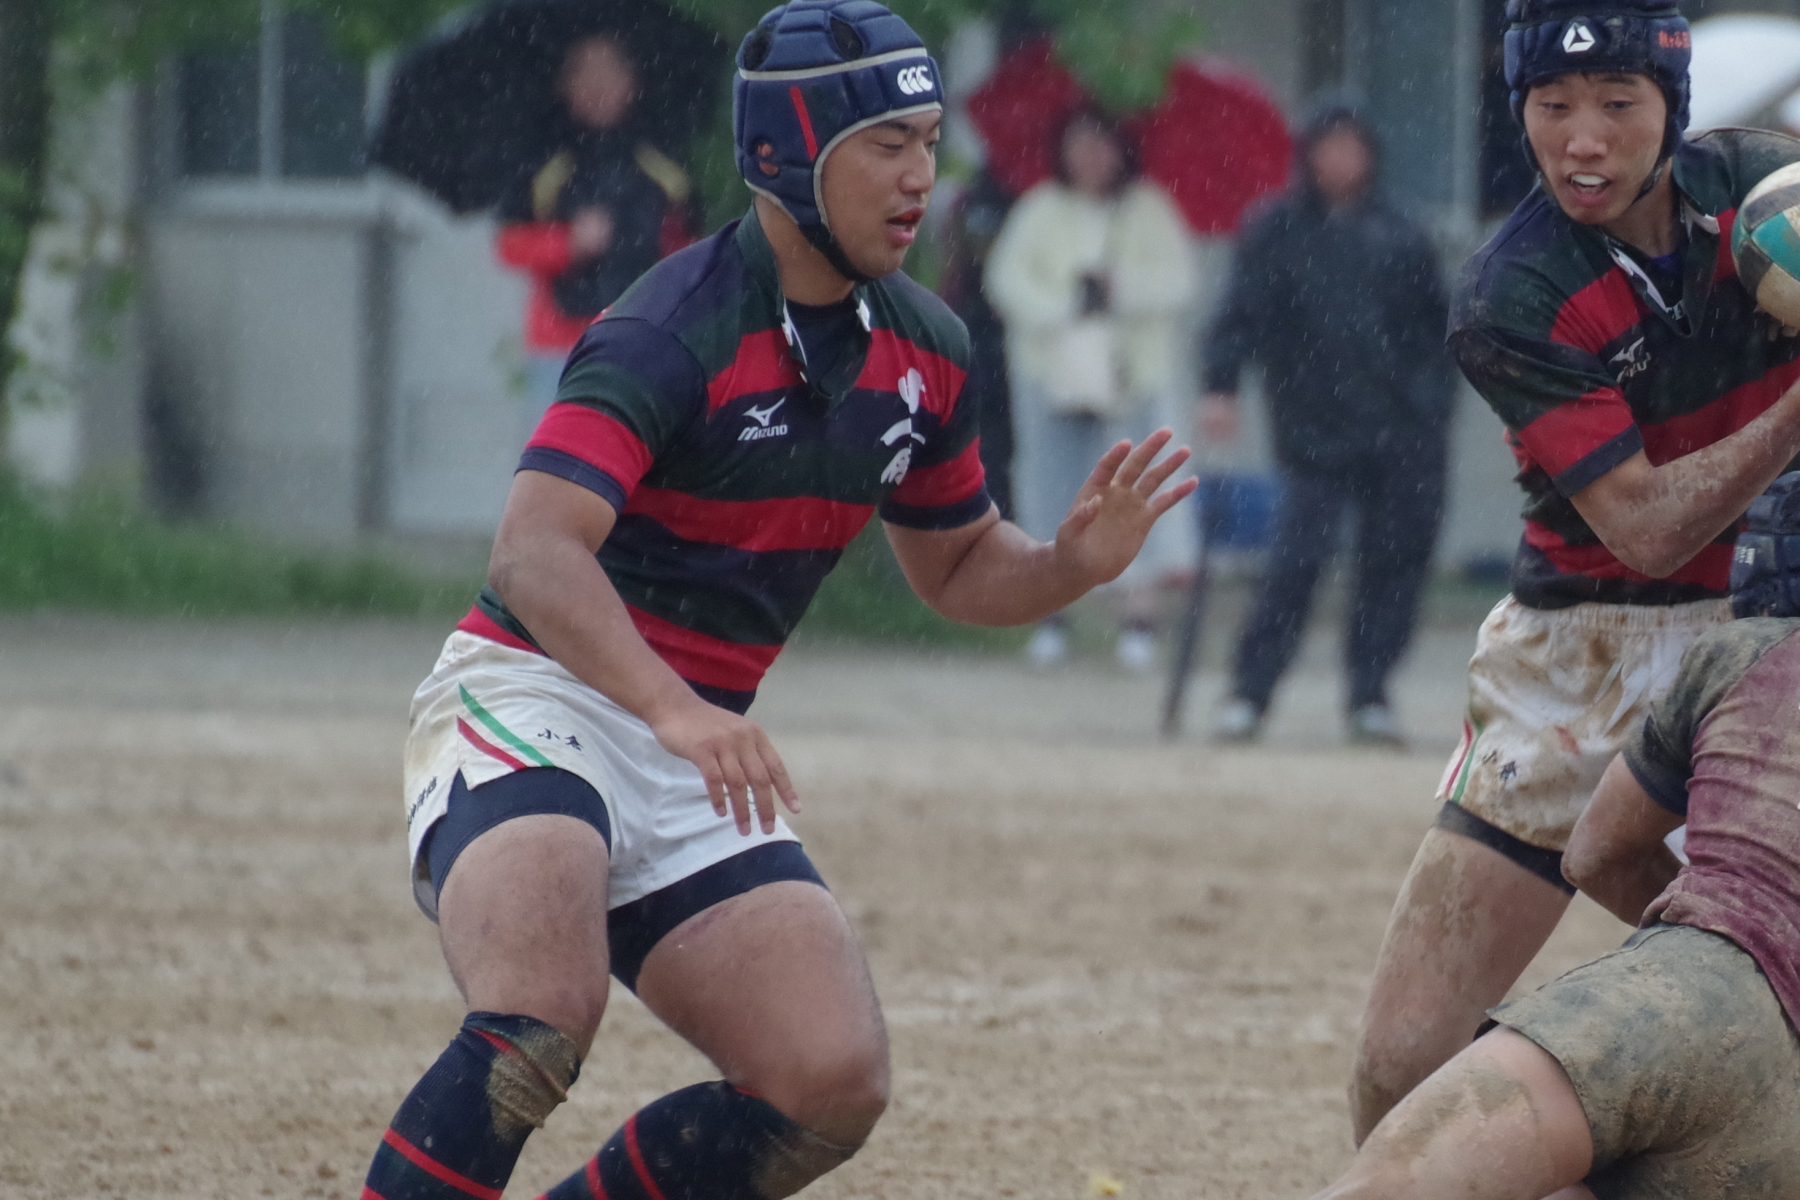 http://kokura-rugby.sakura.ne.jp/180506_144520_0809.jpg